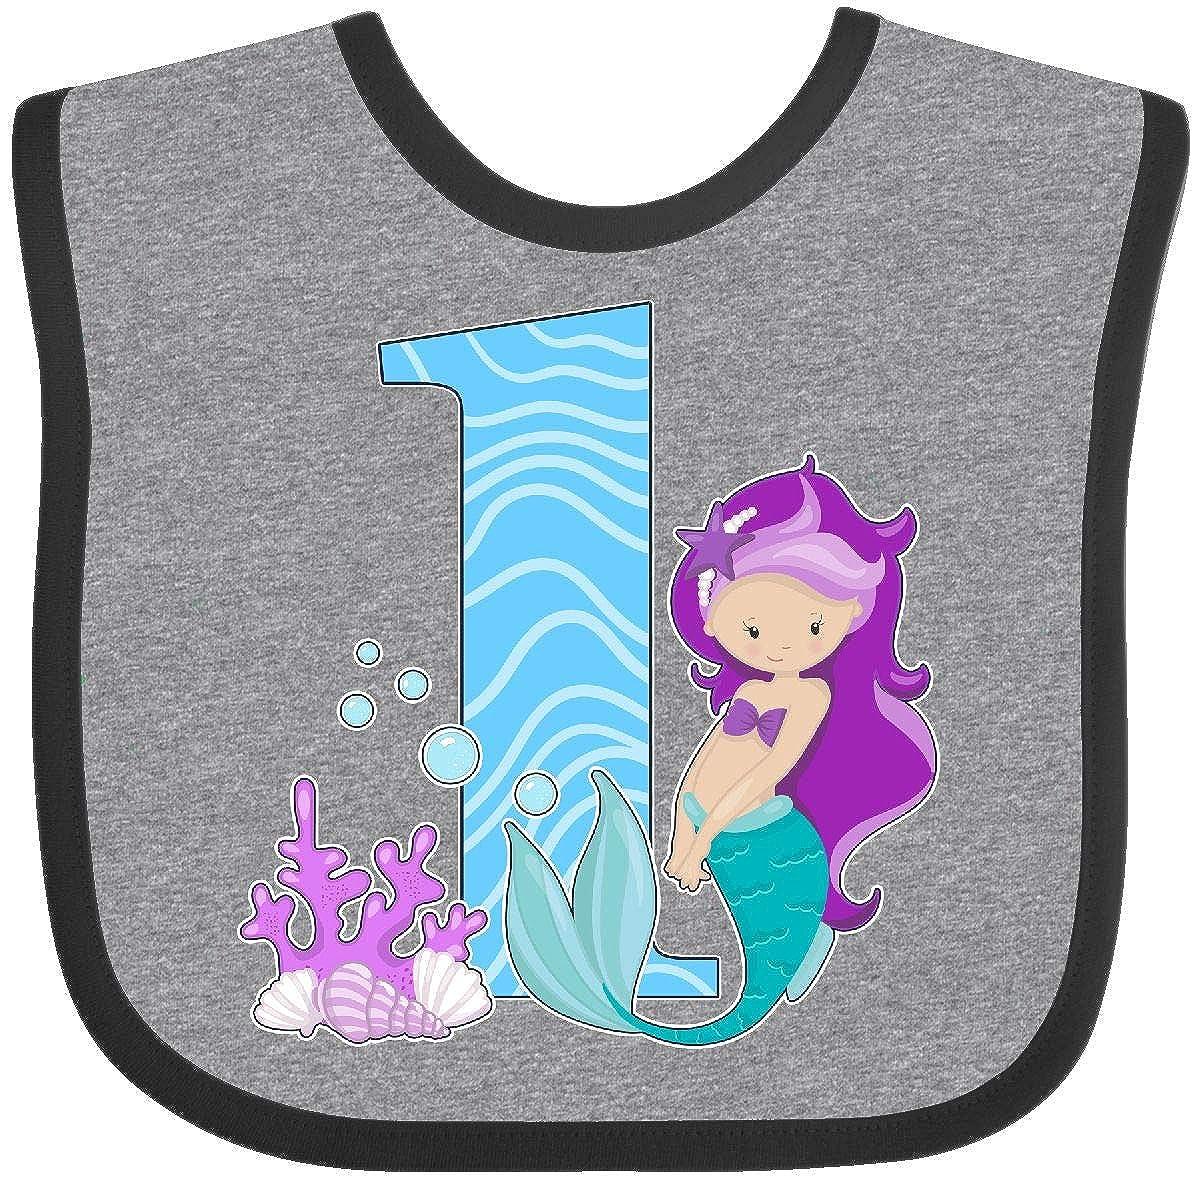 Inktastic - First Birthday- mermaid Baby Bib 2917c 14-168316-116-893-2993